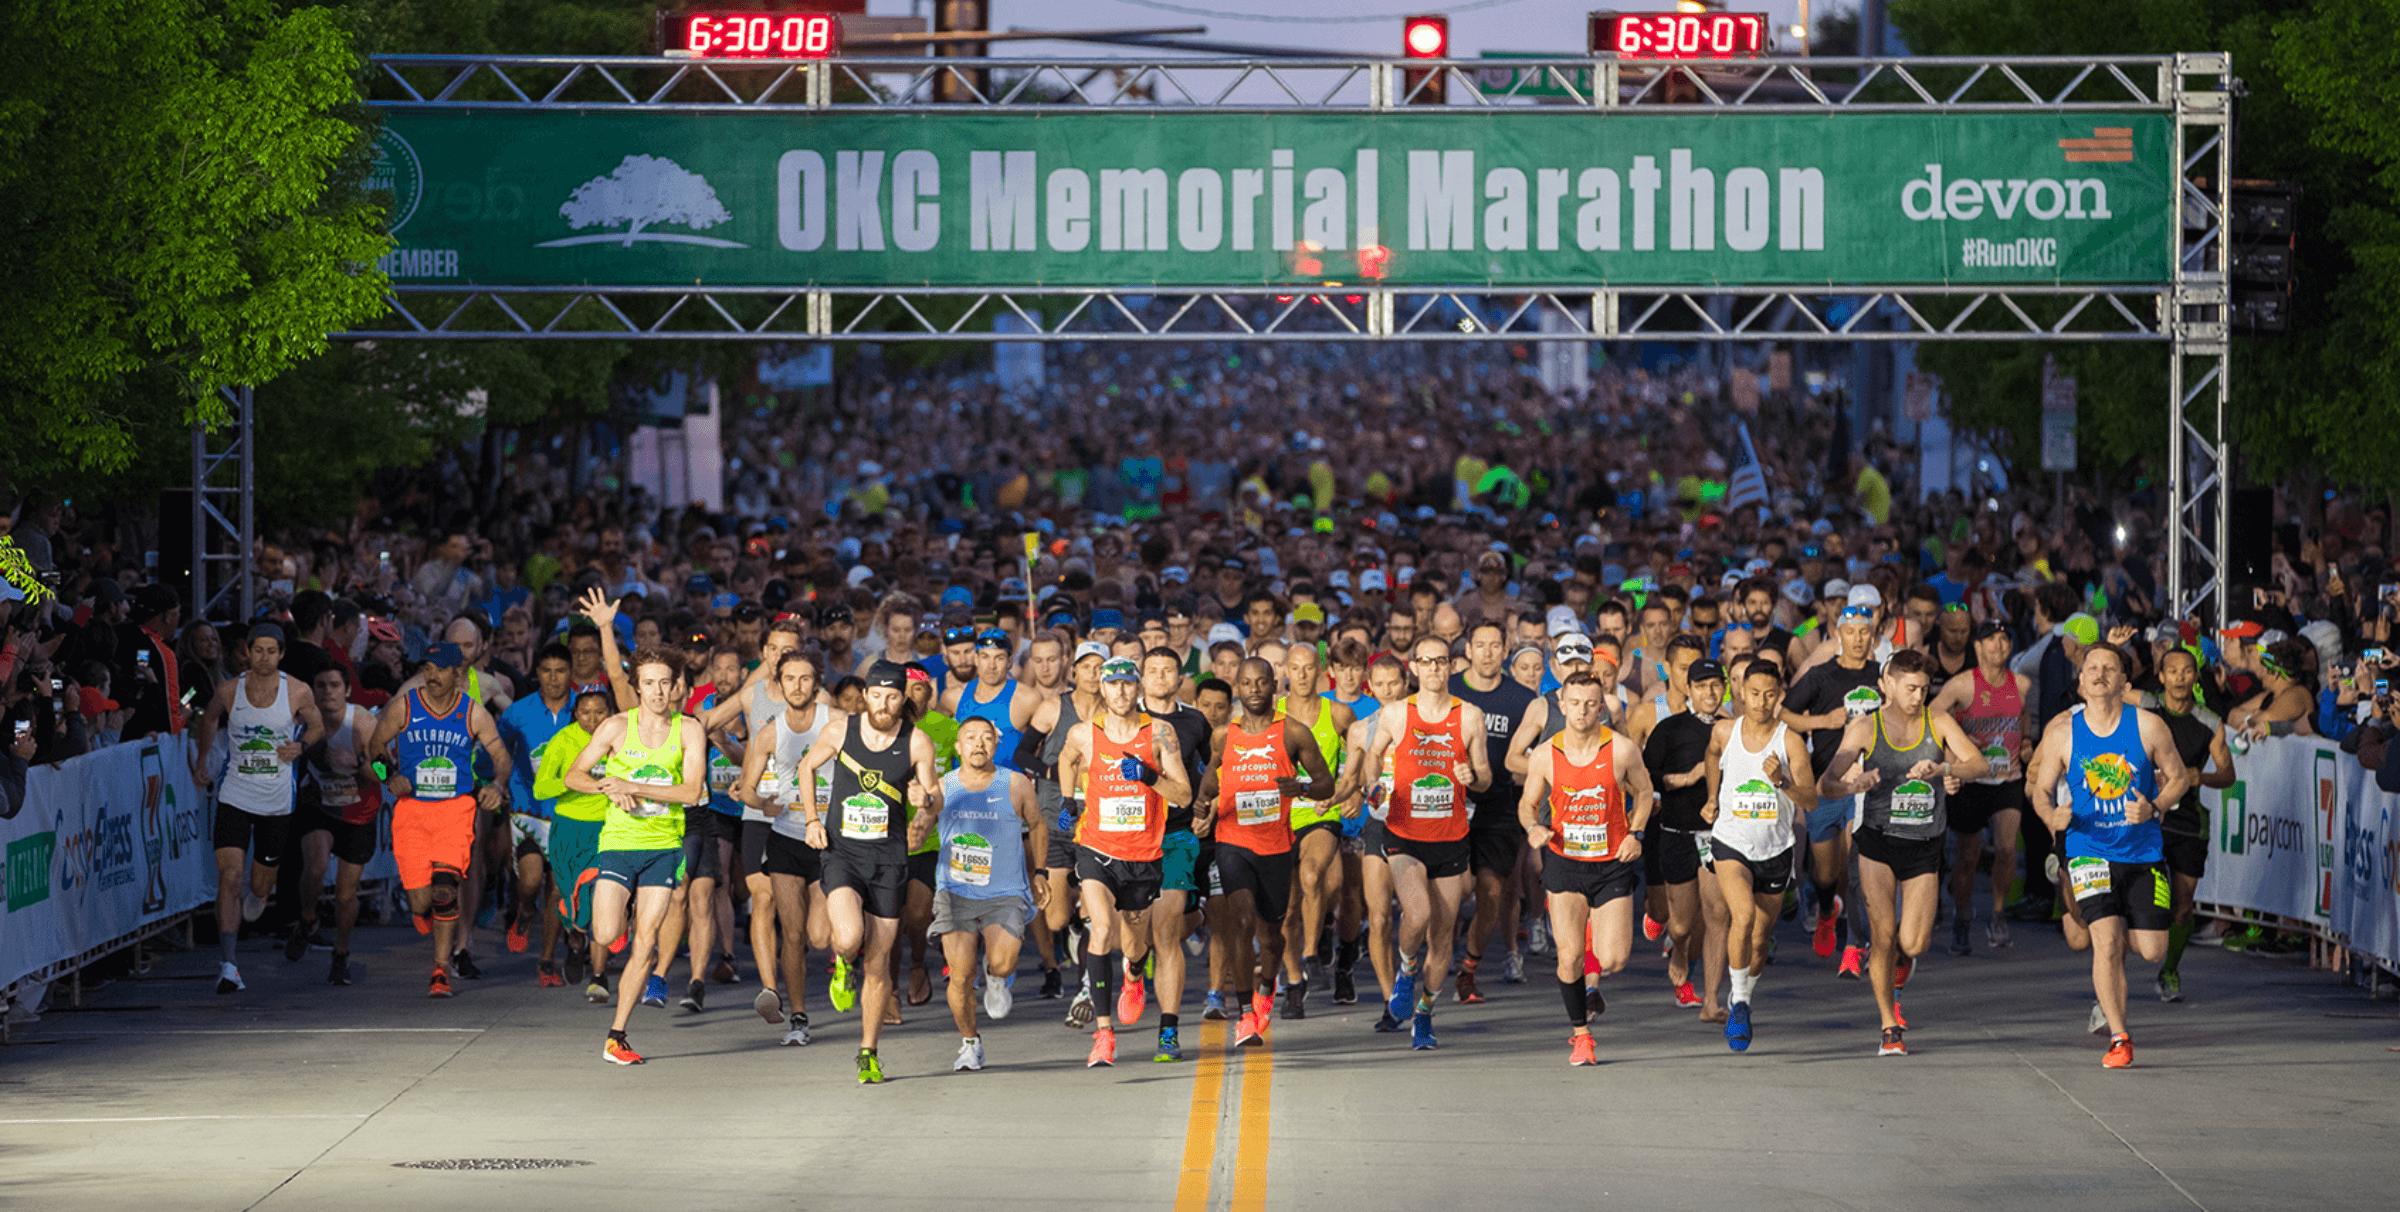 Oklahoma City Memorial Marathon